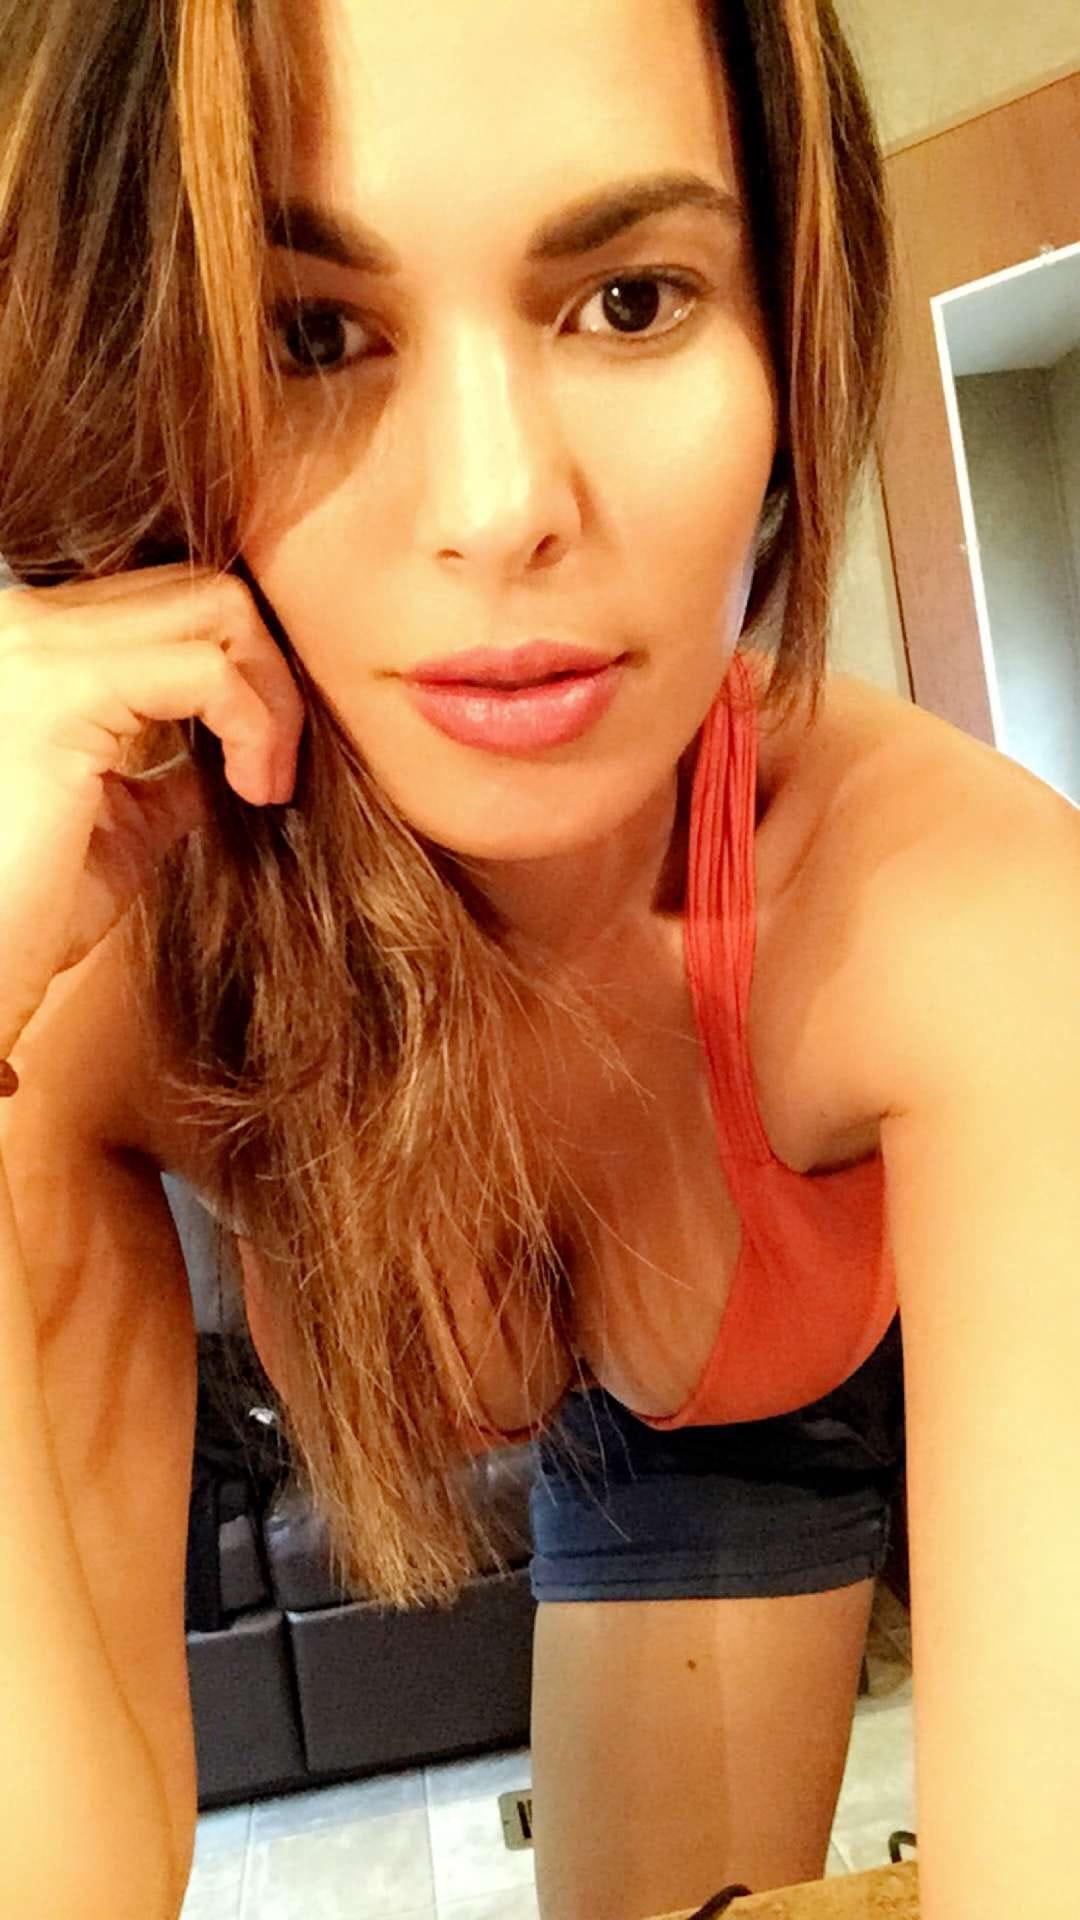 Selfie Nadine Velazquez nudes (25 foto and video), Pussy, Bikini, Boobs, lingerie 2006